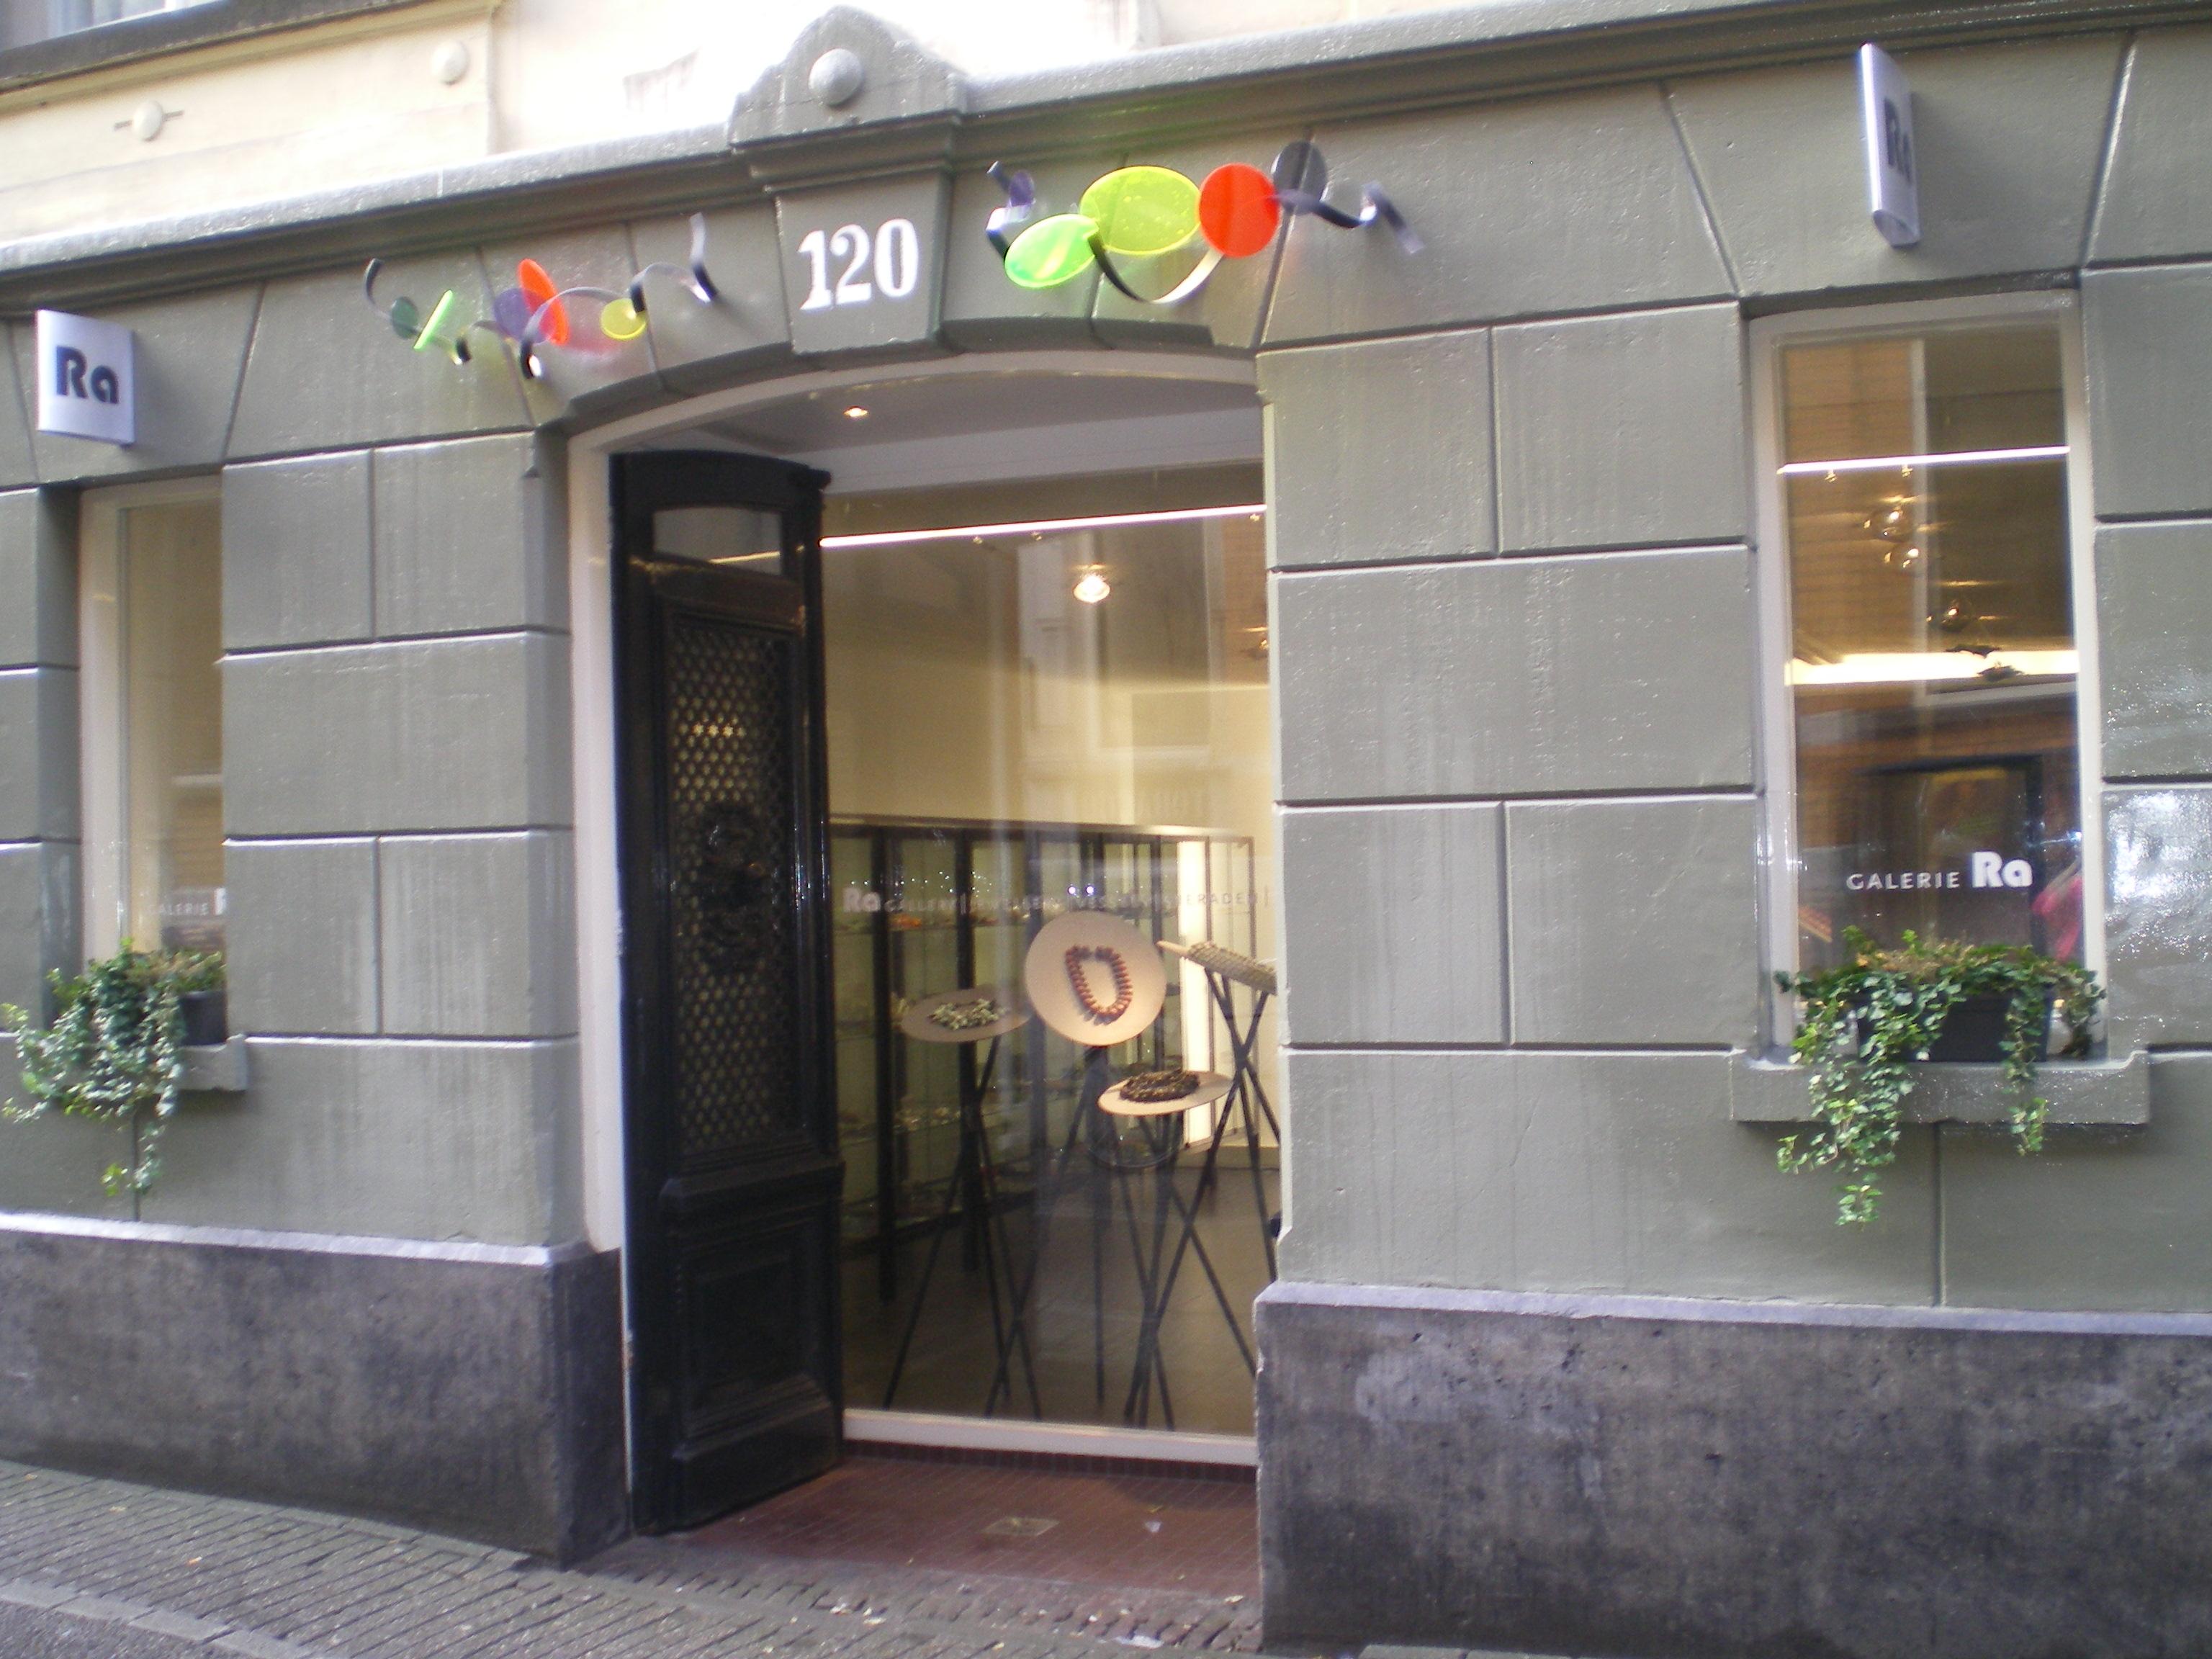 Galerie Ra, Nes, Amsterdam, gevel